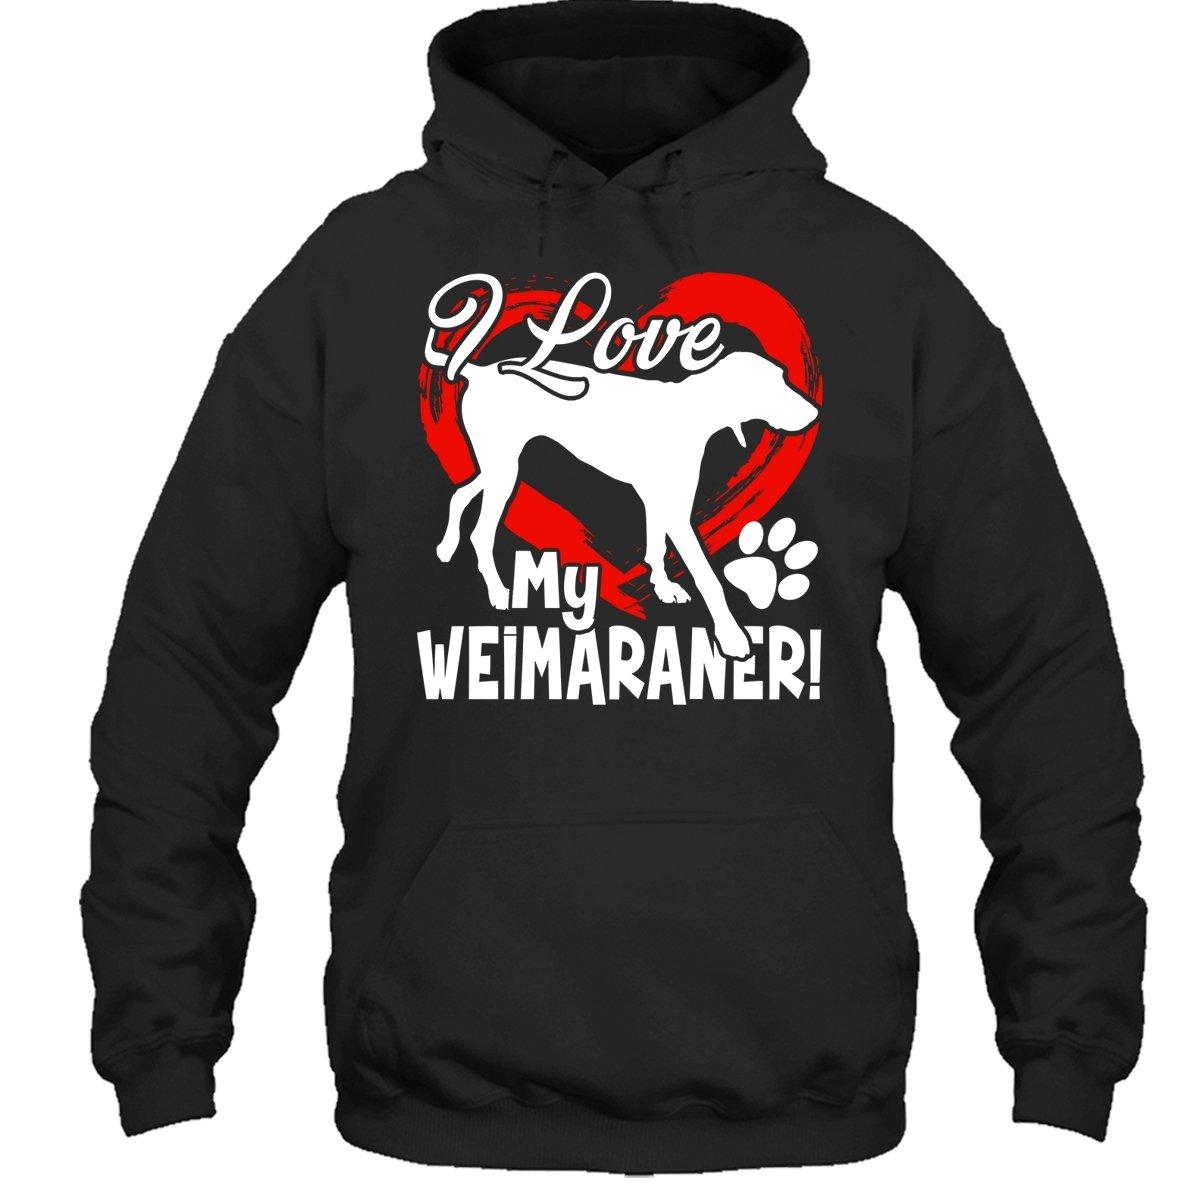 Zira-S Weimaraner T-Shirt I Love My Weimaraner T Shirt Design